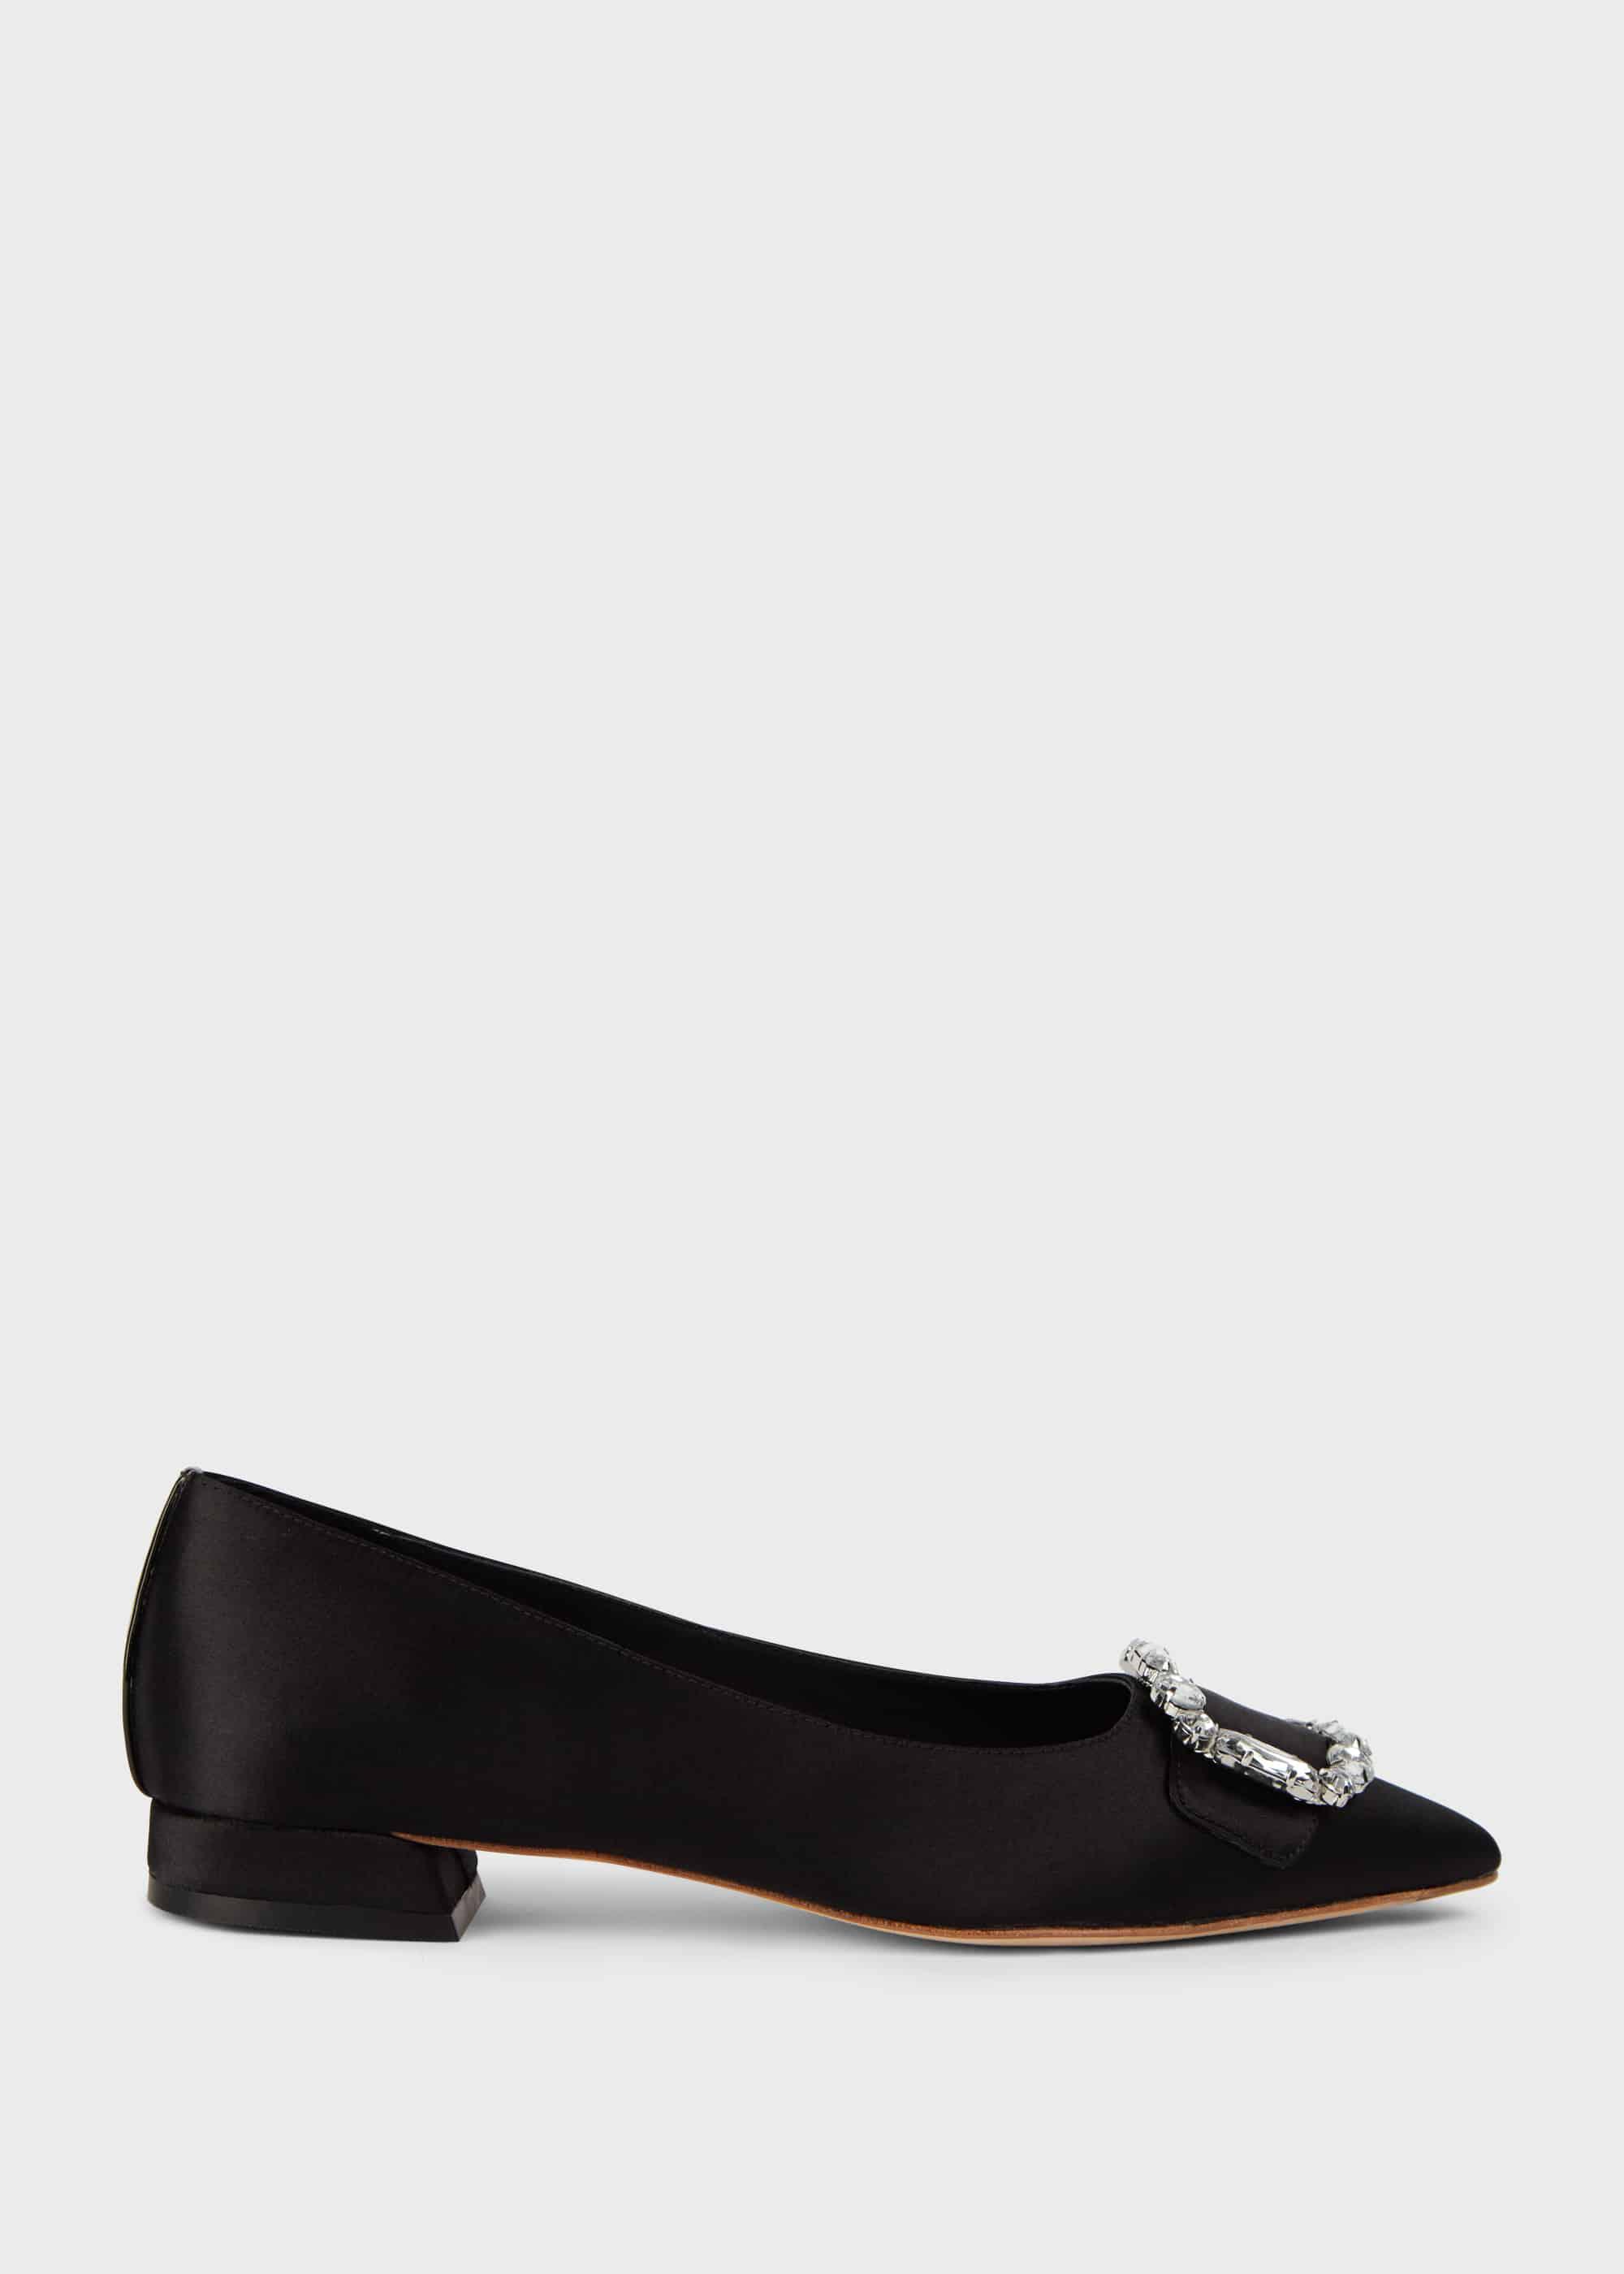 Hobbs Women Lucinda Suede Flat Shoes